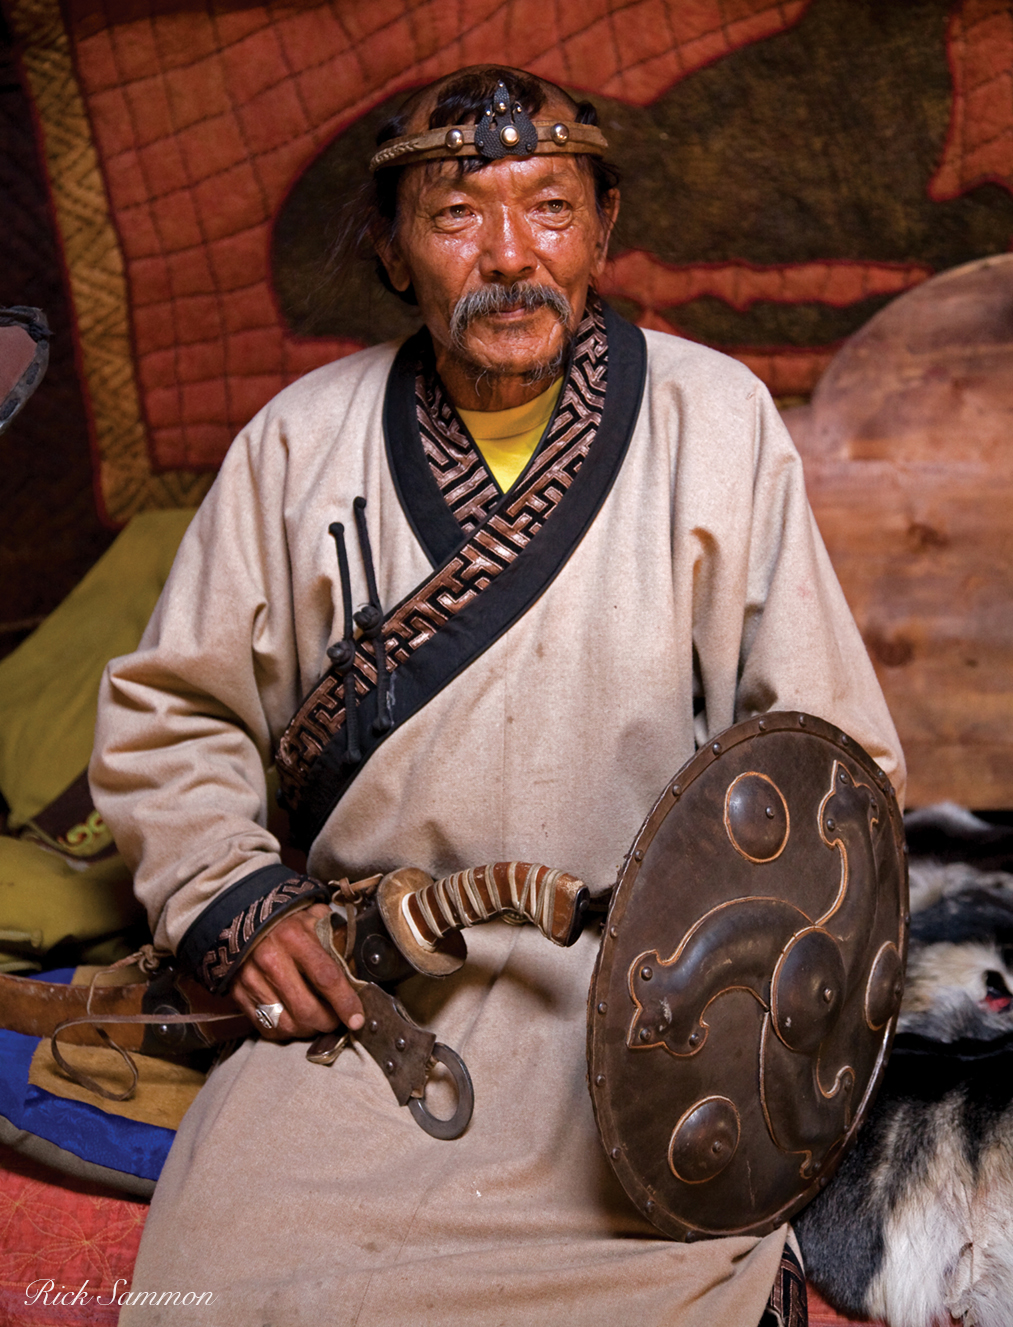 Rick Sammon Mongolia 7.jpg